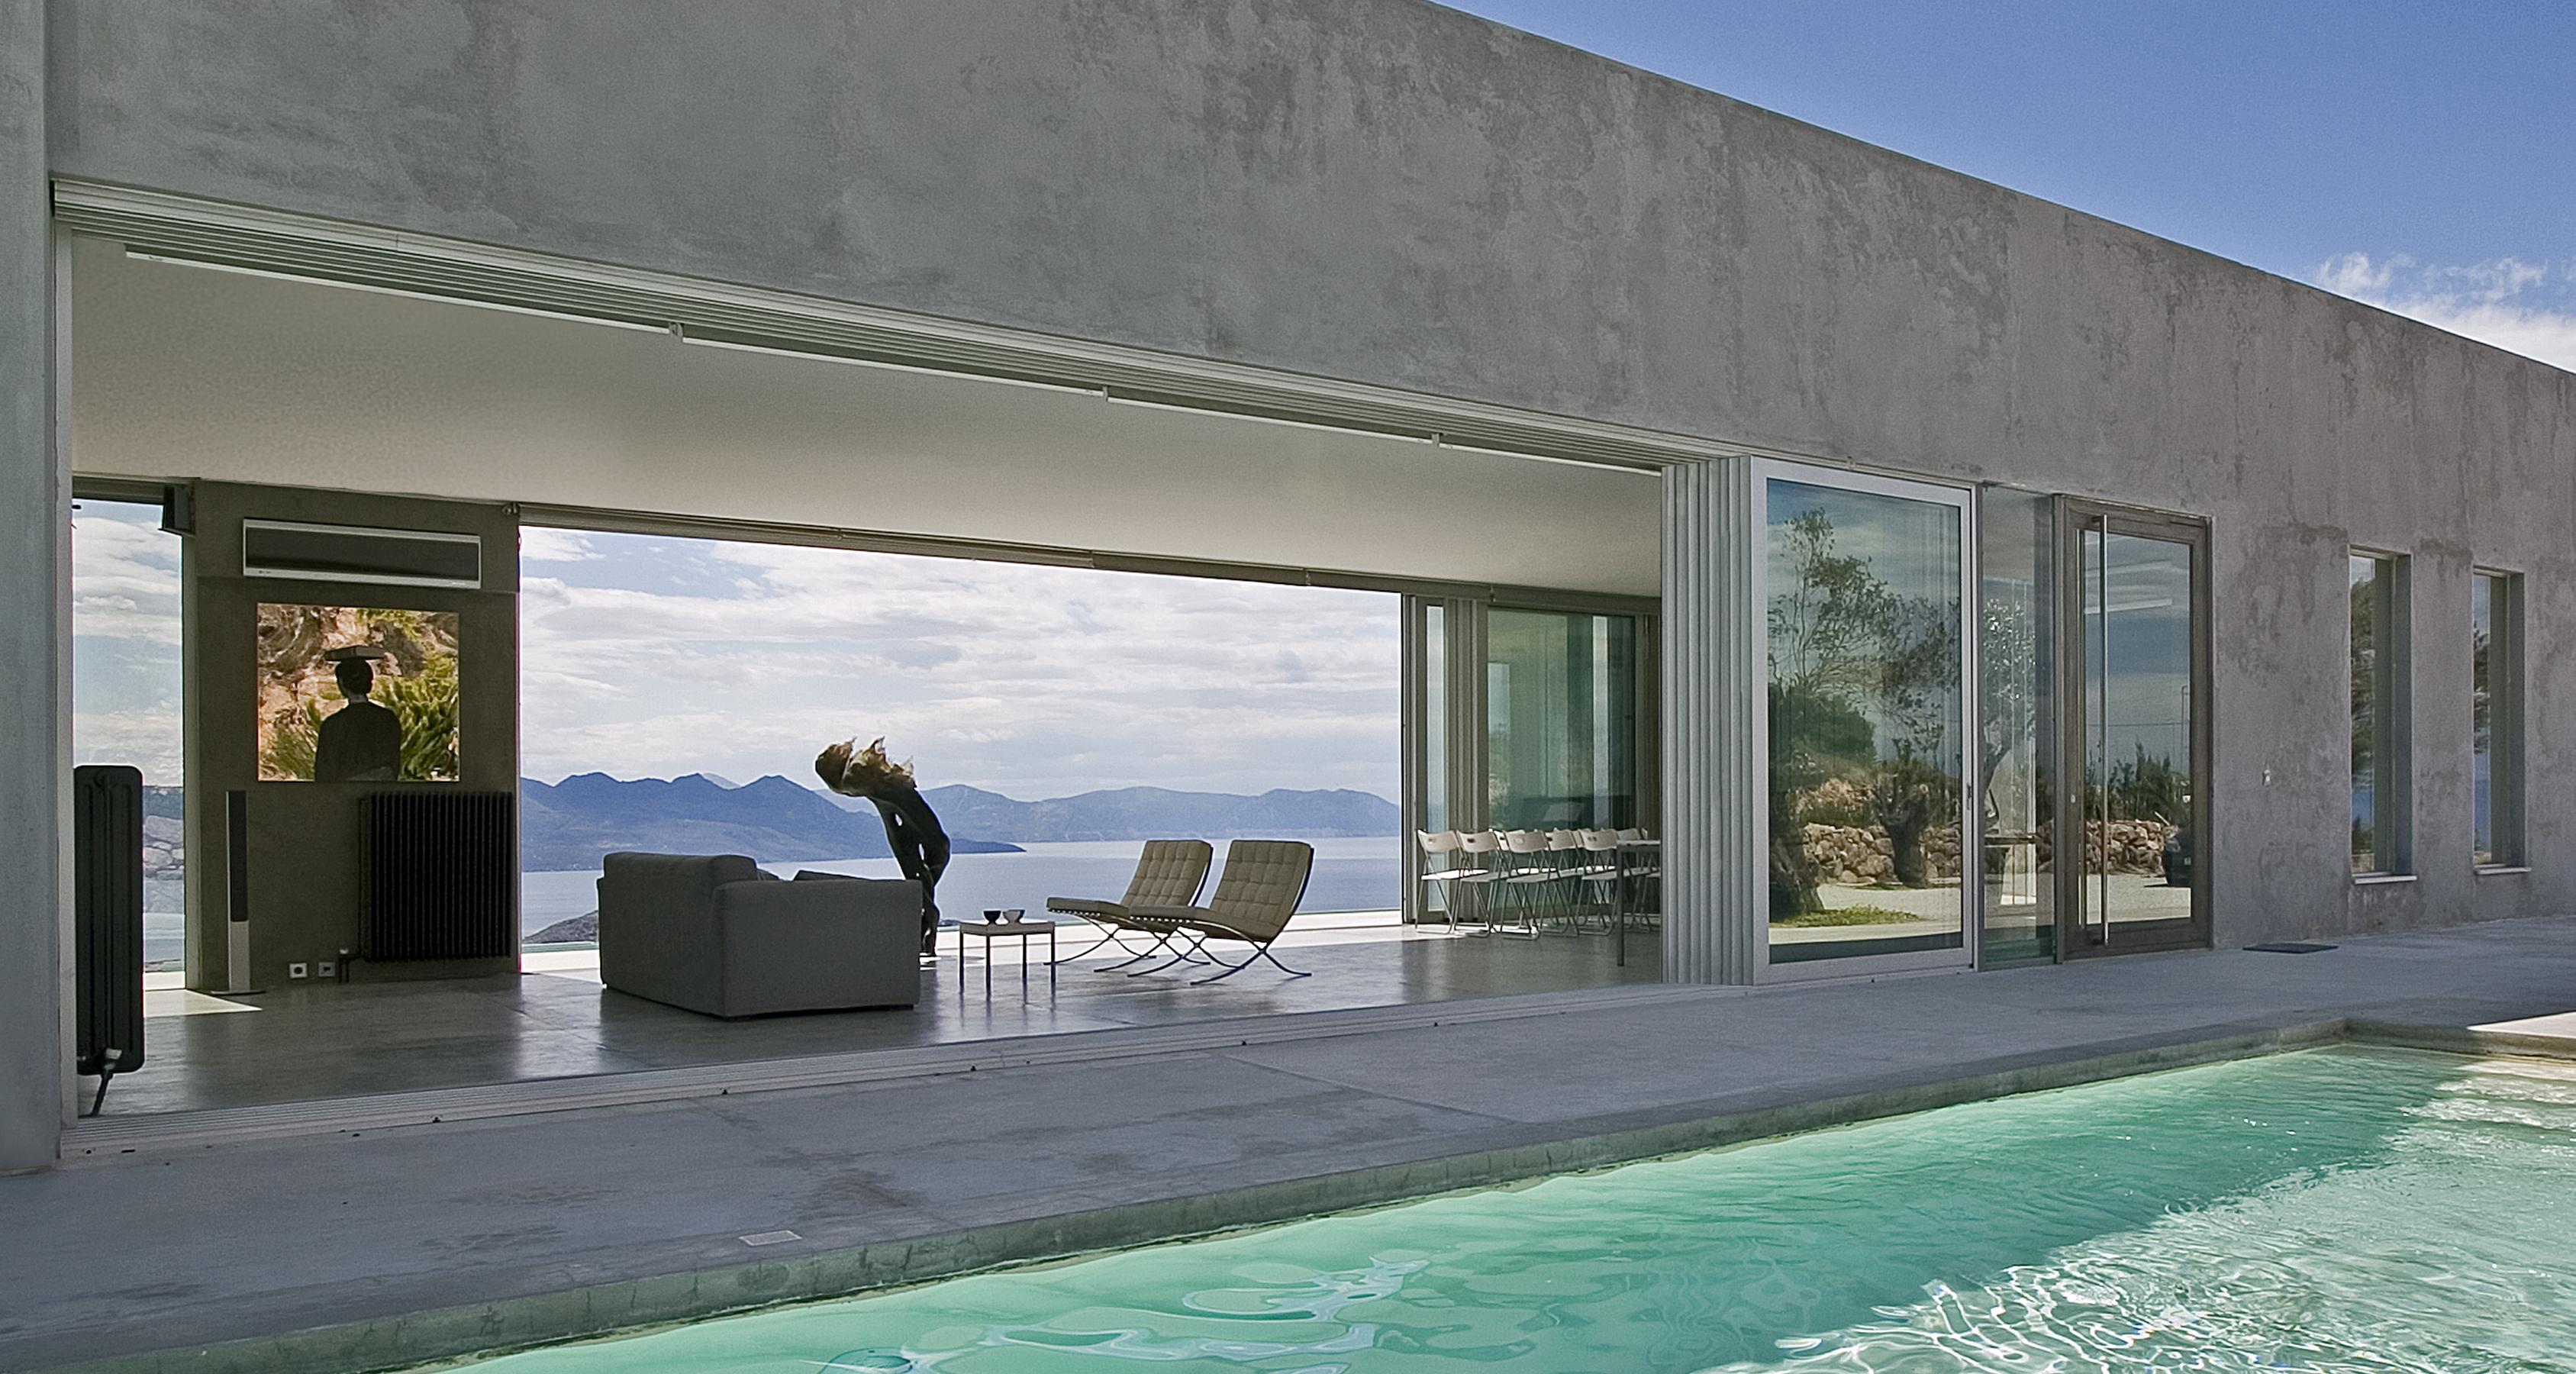 10 Ft High Sliding Glass Doors3375 X 1800